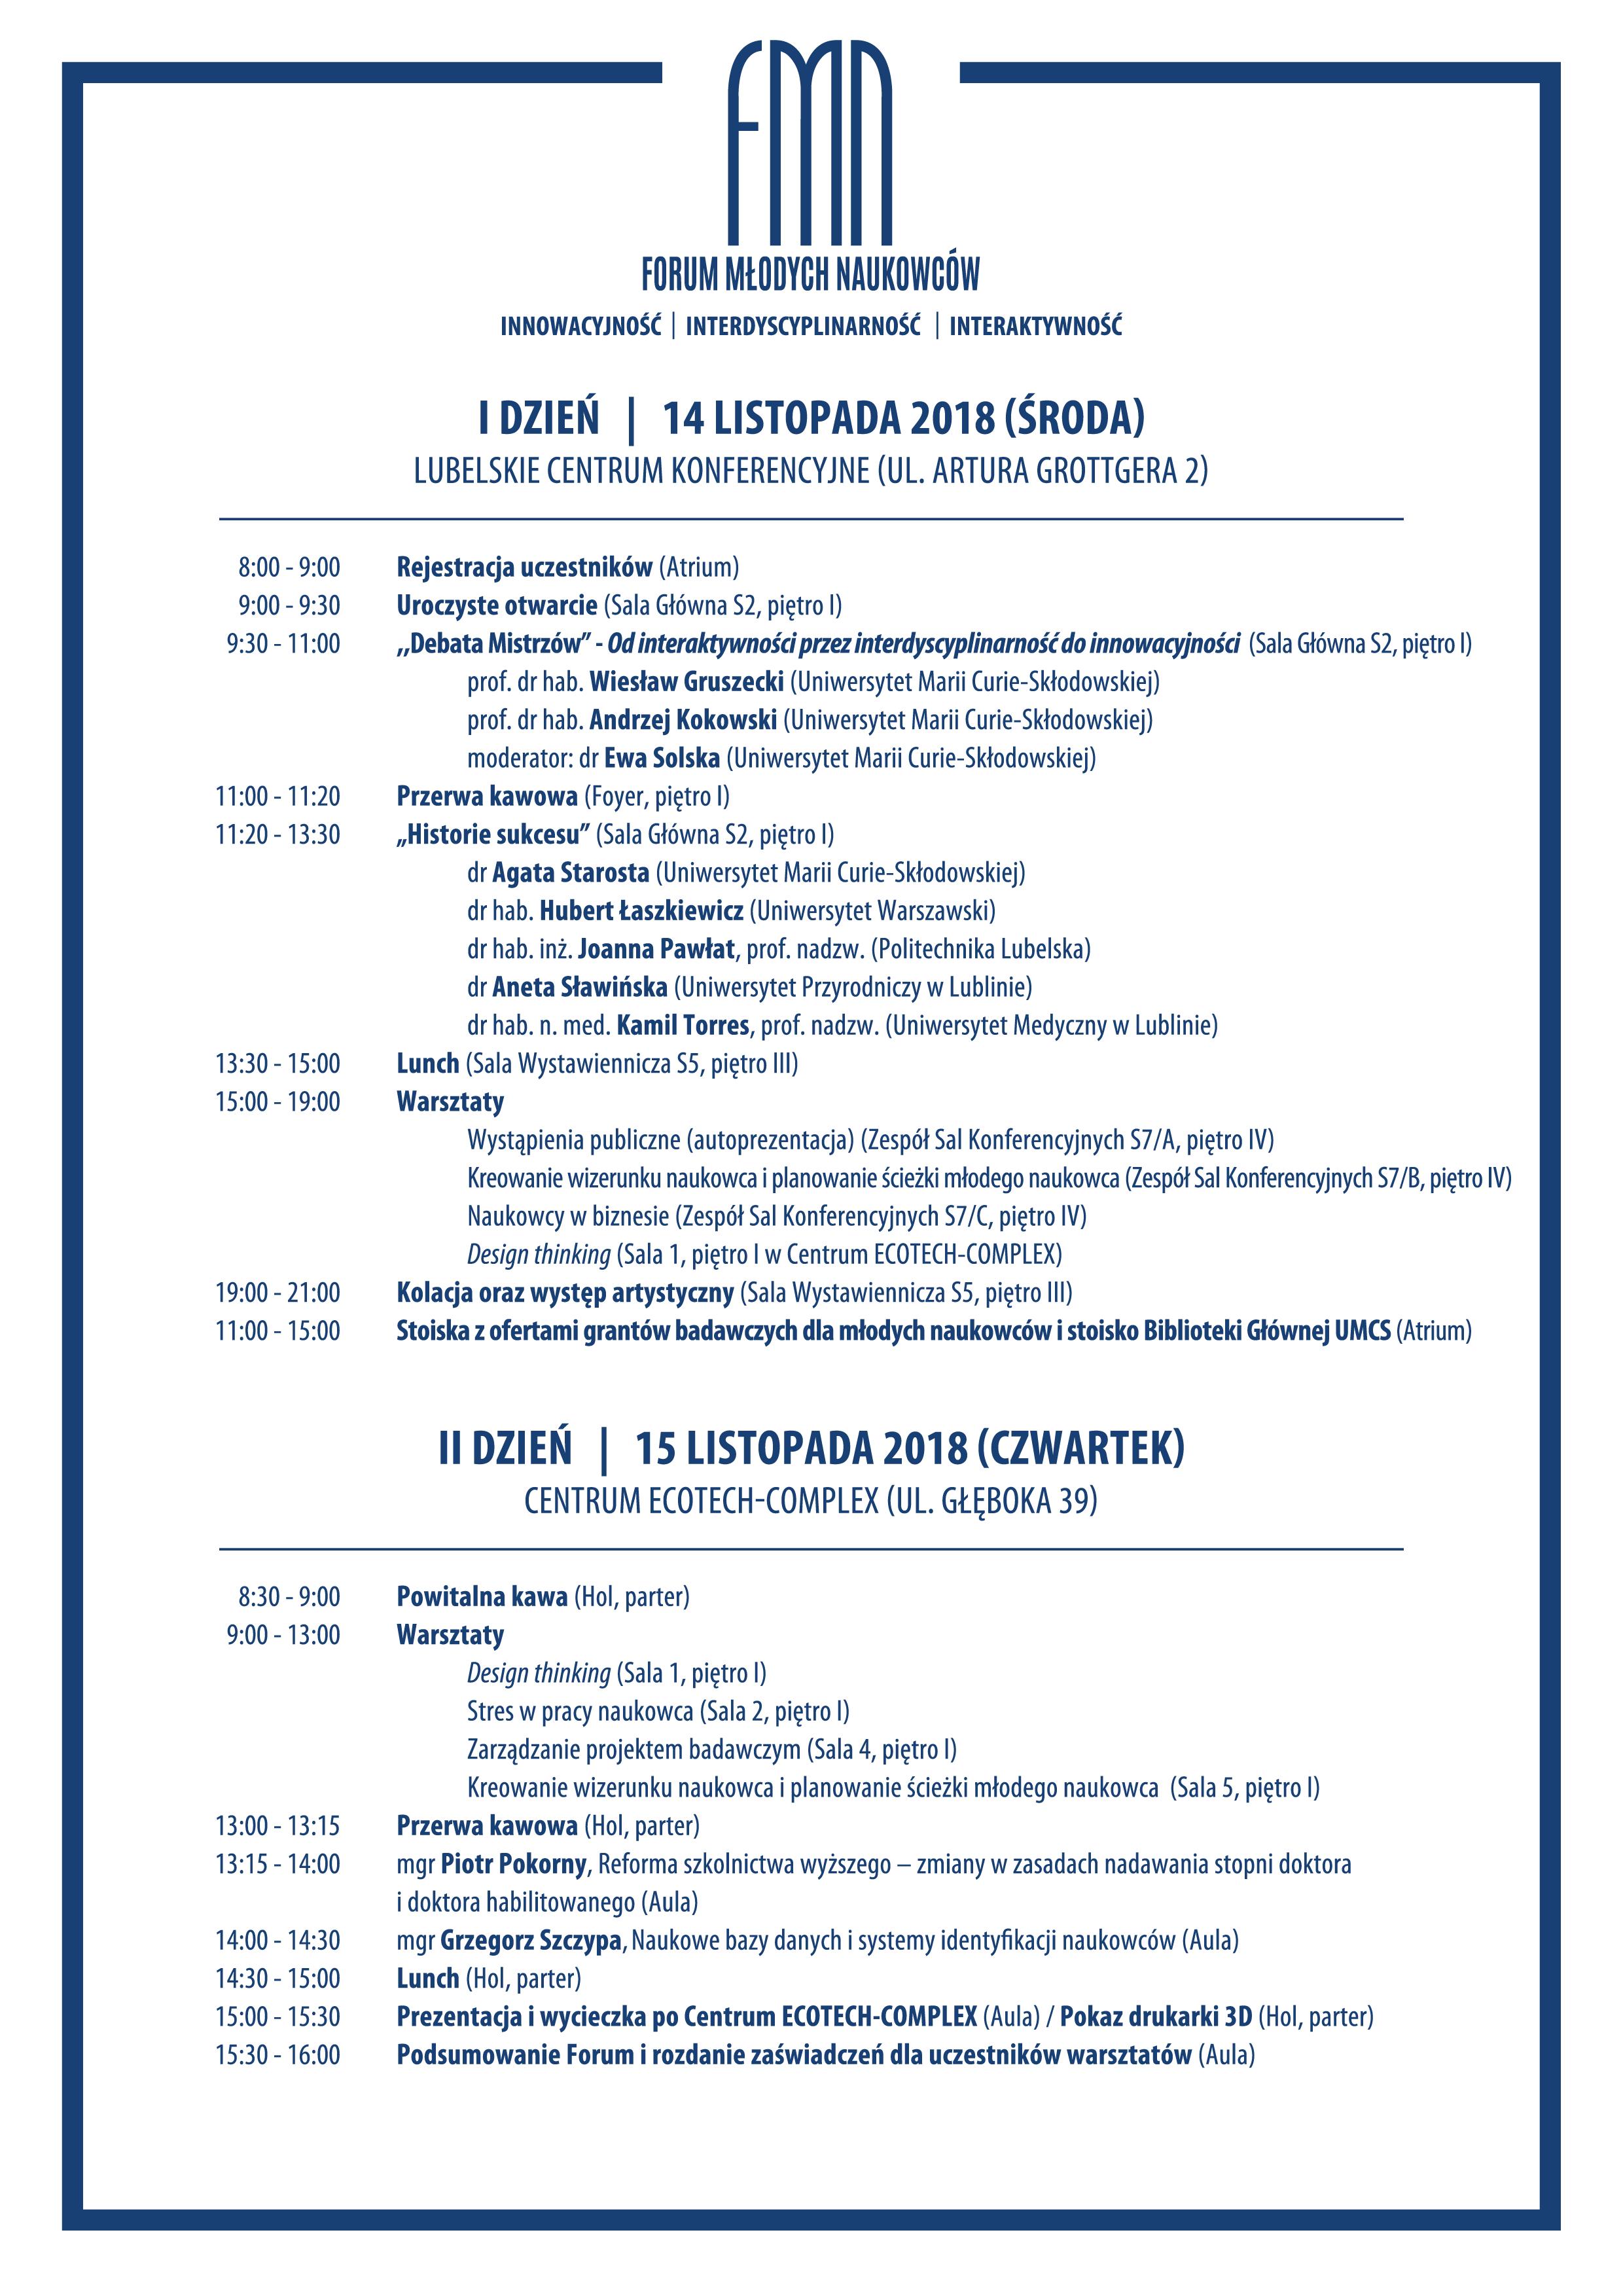 Program strona_1 13.11.png